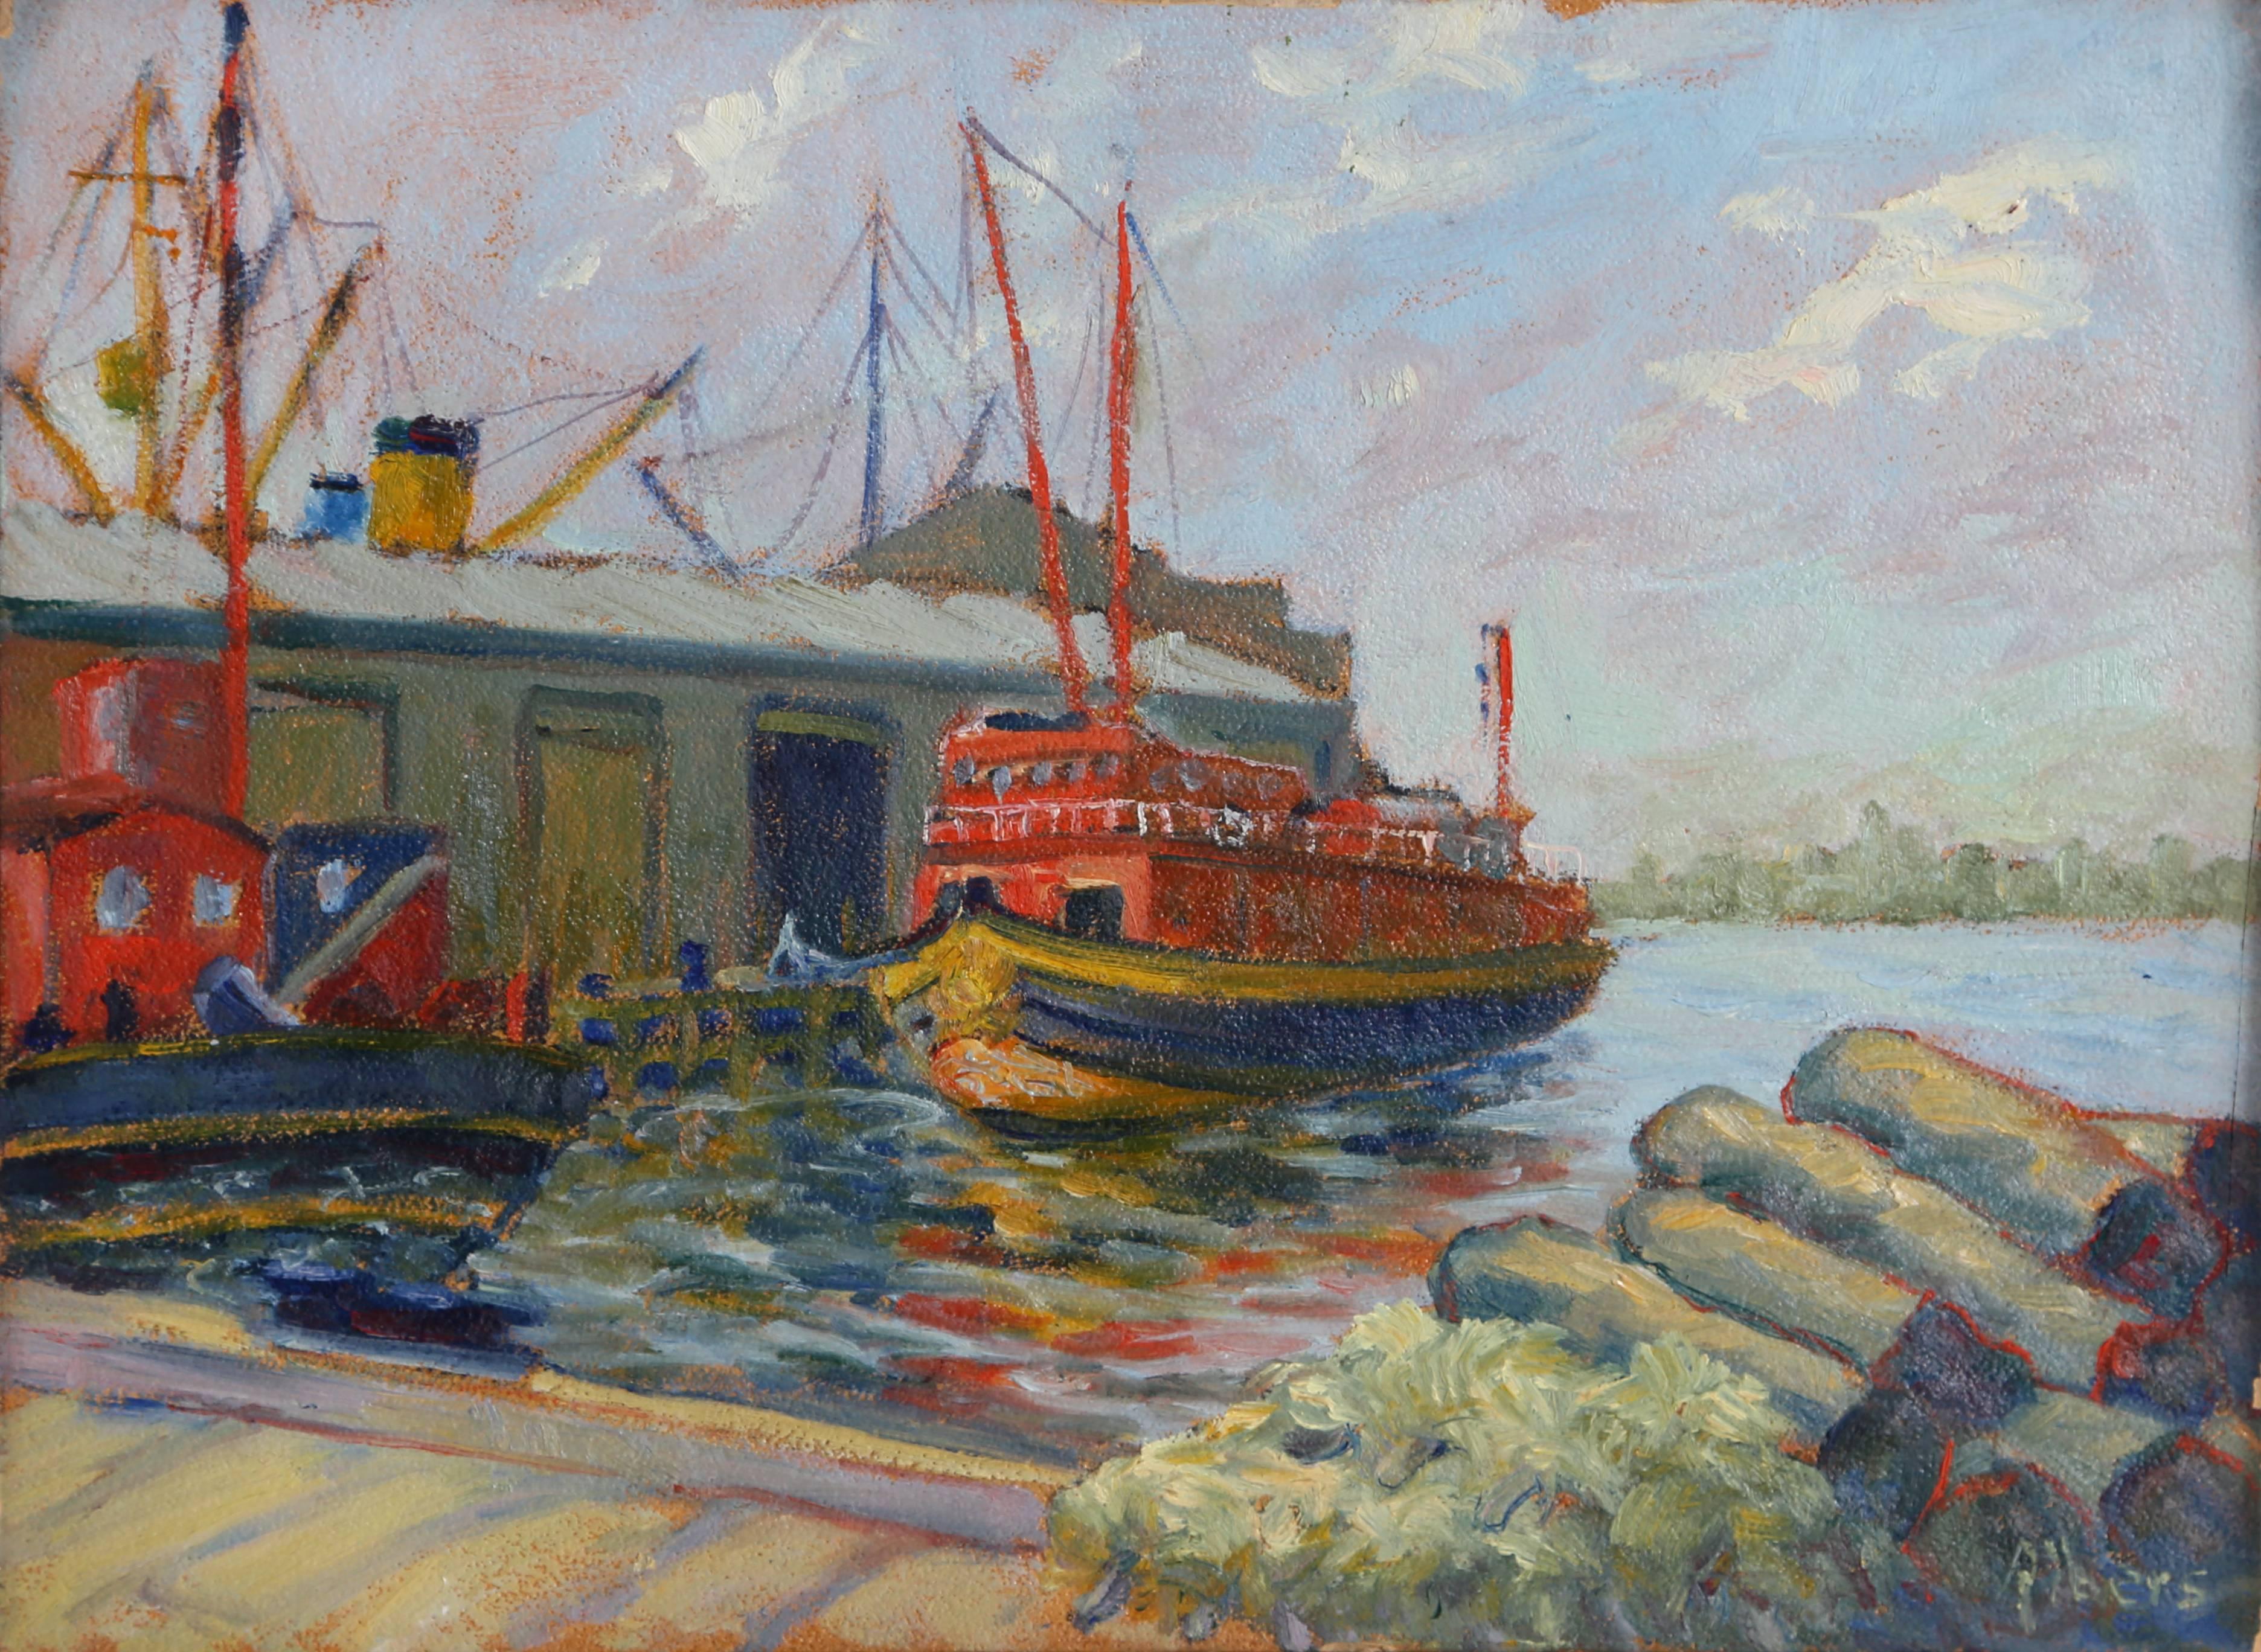 The Wildwood, New York Harbor painting circa 1940